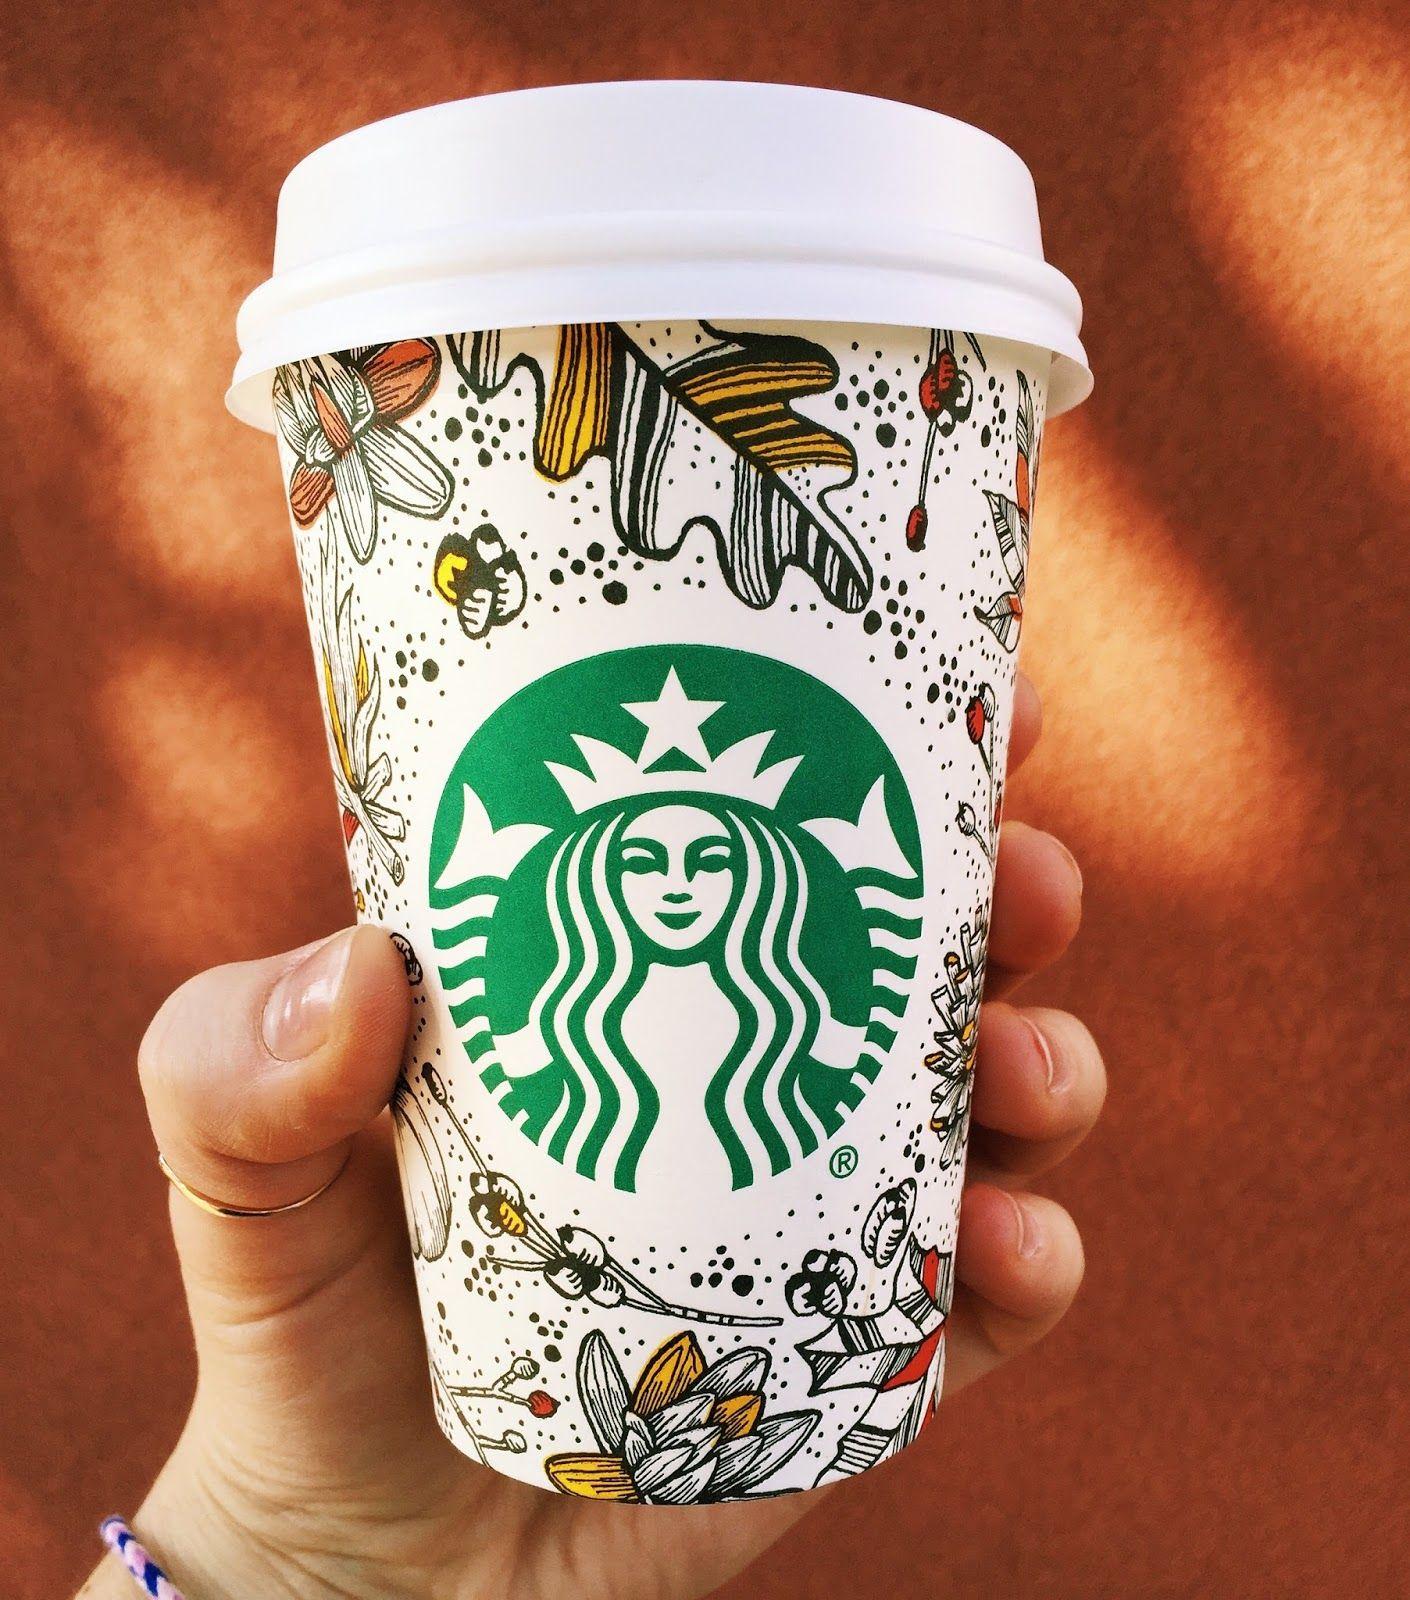 VA>OK>L.A. Hot coffee, Starbucks hot